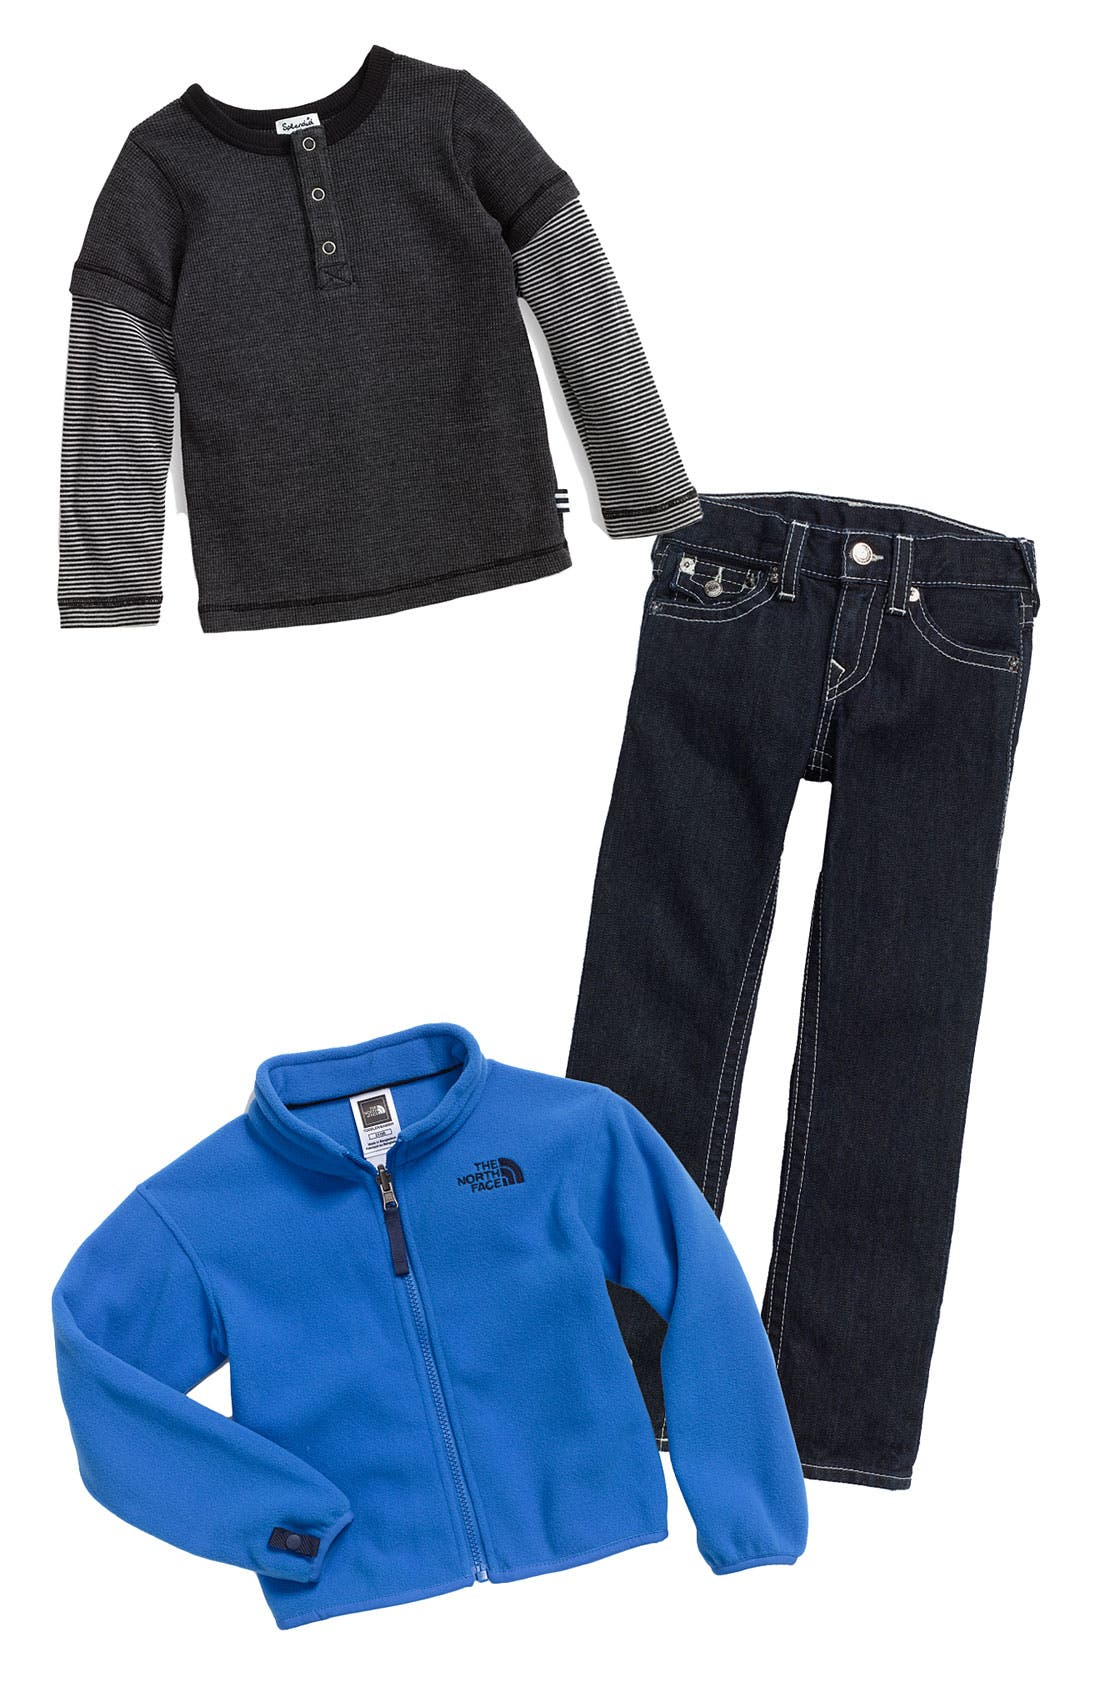 Alternate Image 1 Selected - The North Face Jacket, Splendid Henley & True Religion Brand Jeans Straight Leg Jeans (Toddler)